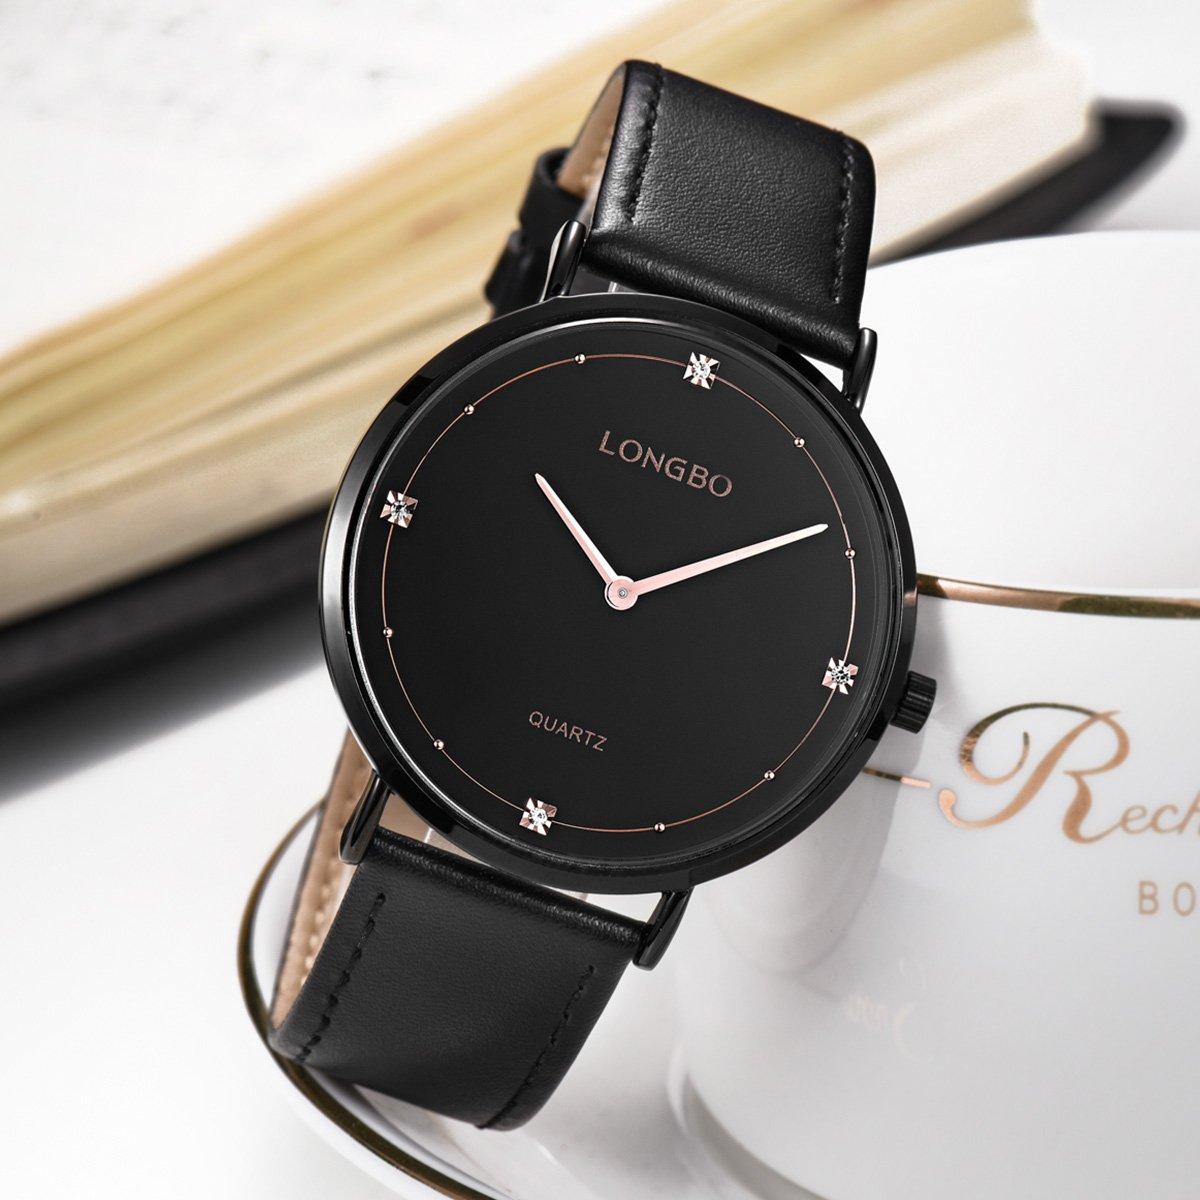 d8d0499140 Amazon | スタイリッシュなメンズ腕時計黒革バンドクォーツ時計は、金の手とラインストーン高貴な時計をバラ | メンズ腕時計 | 腕時計 通販